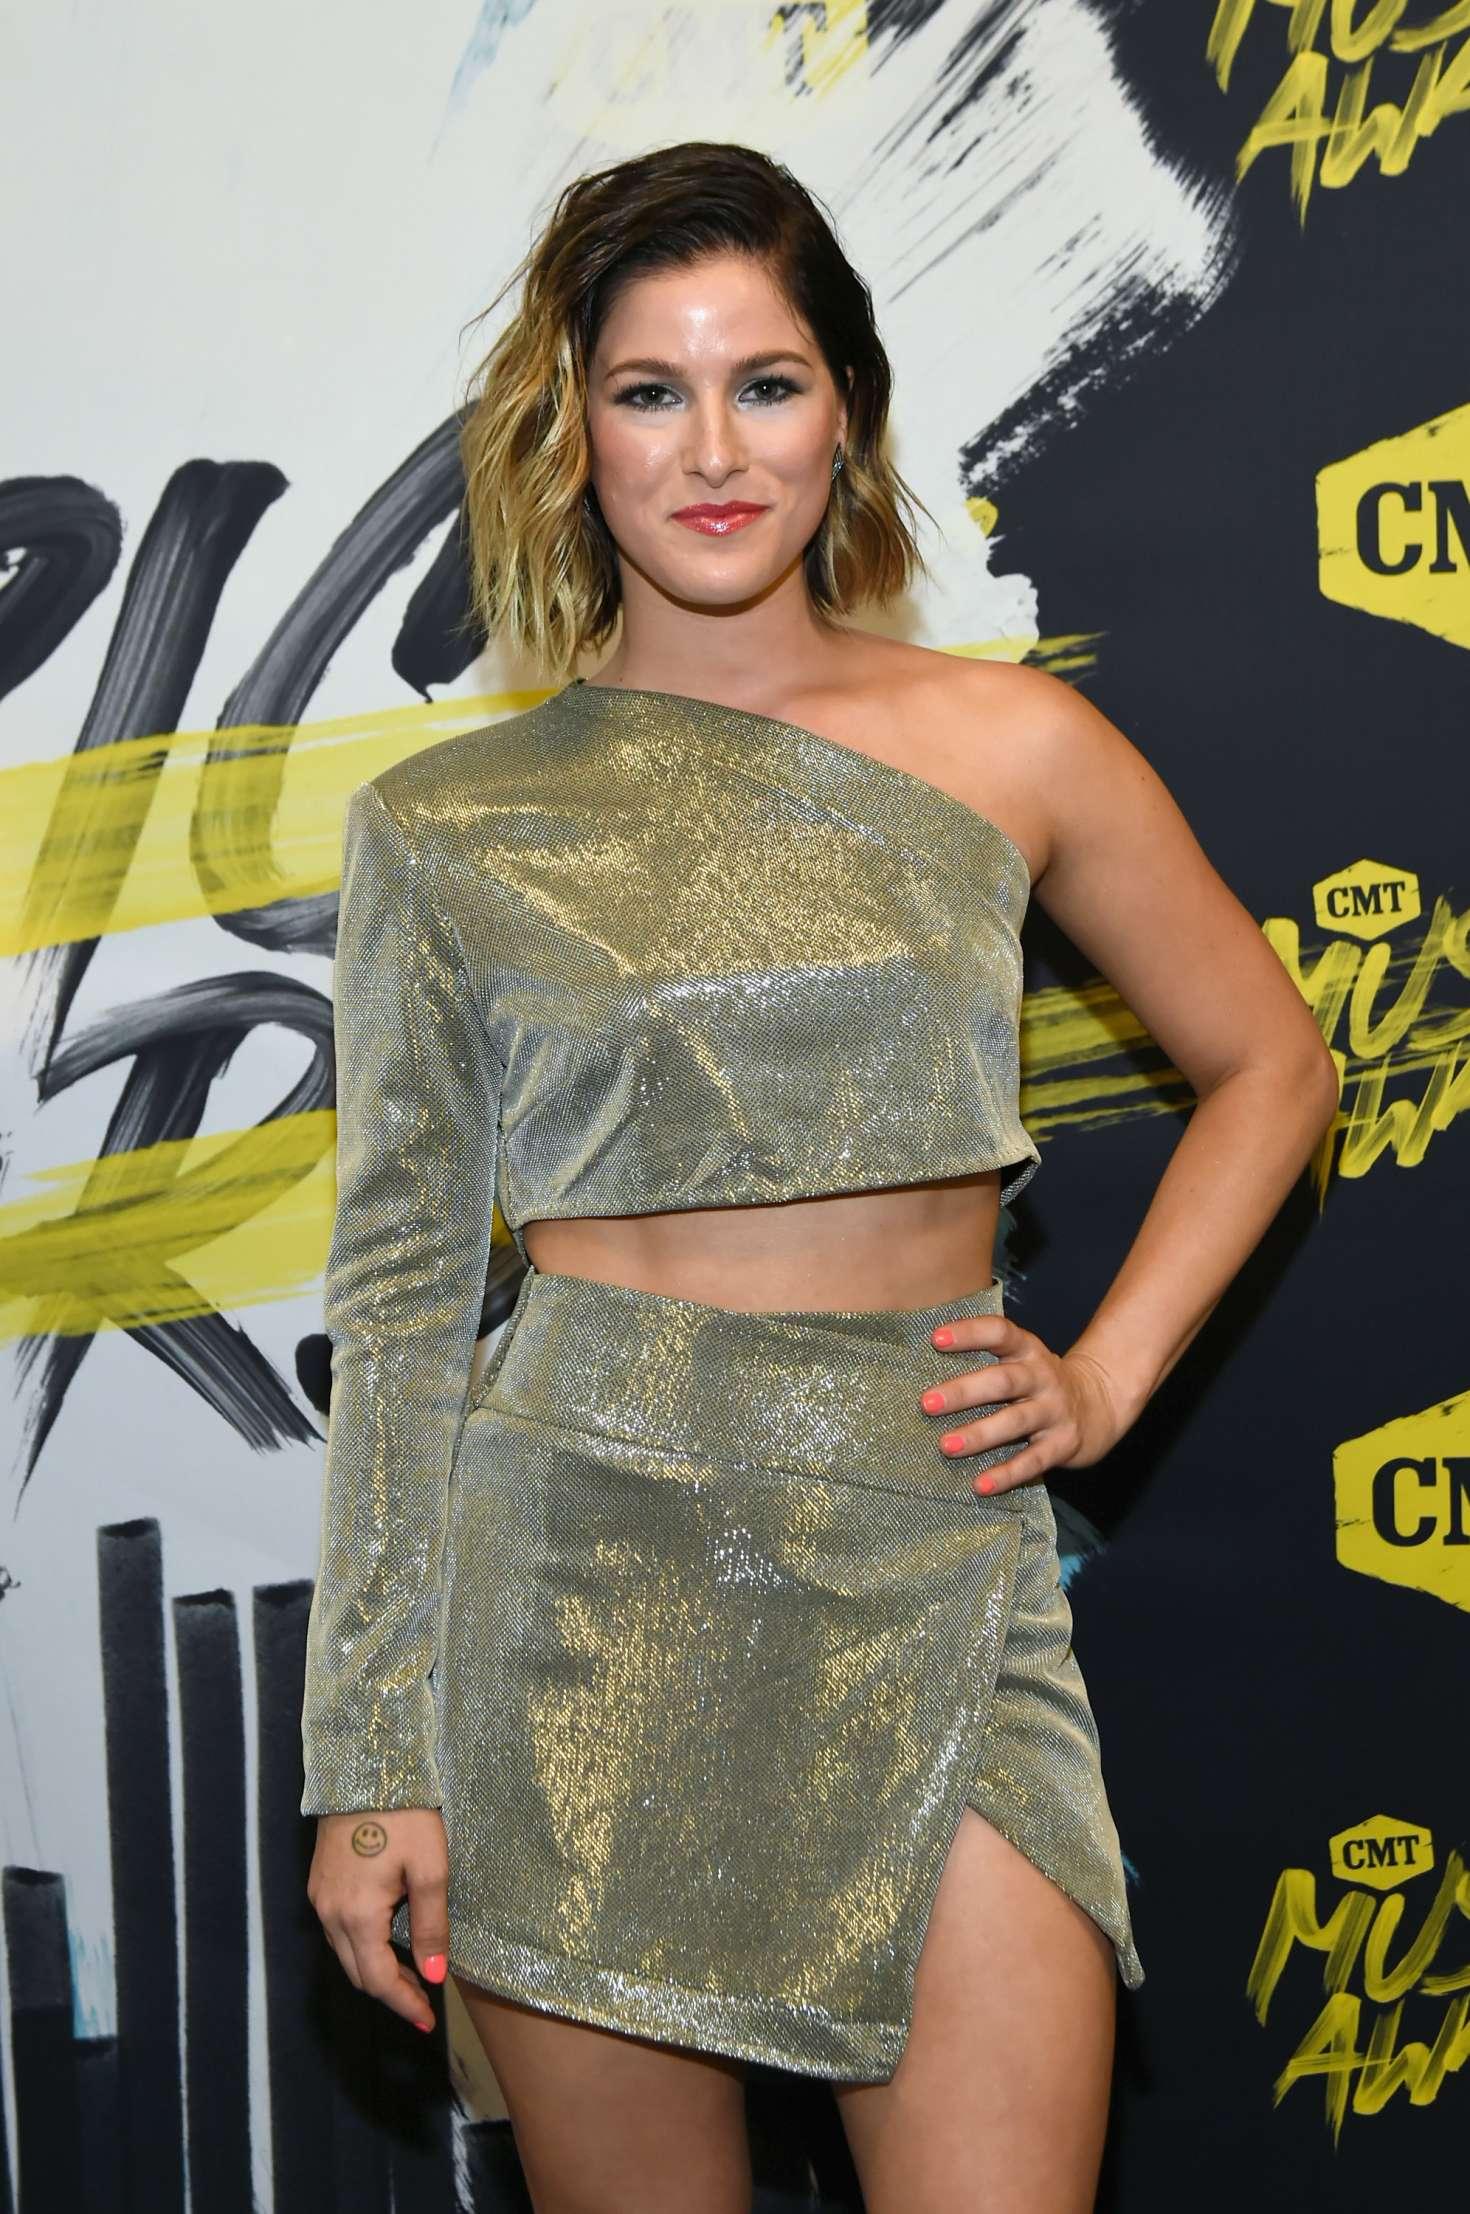 Cassadee Pope 2018 : Cassadee Pope: 2018 CMT Music Awards -05